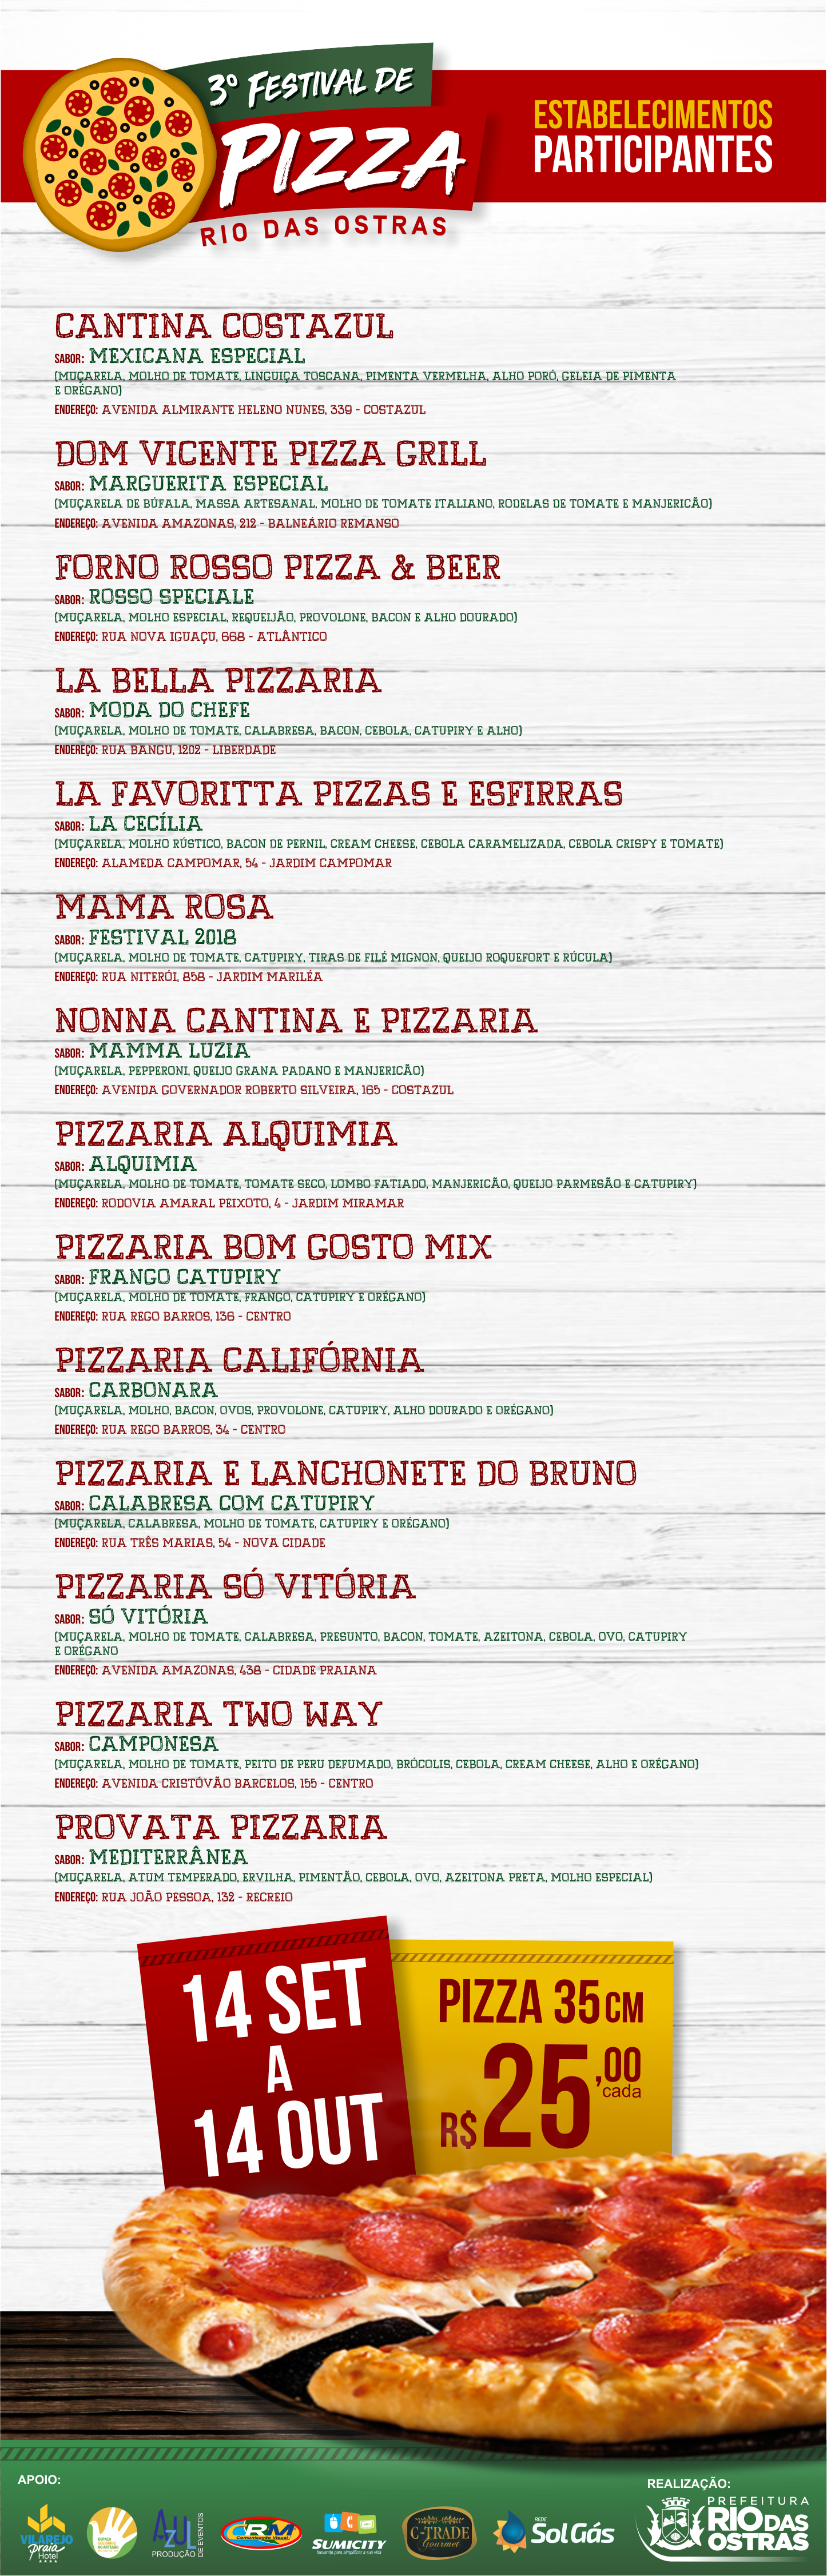 3º Festival de Pizza Rio das Ostras